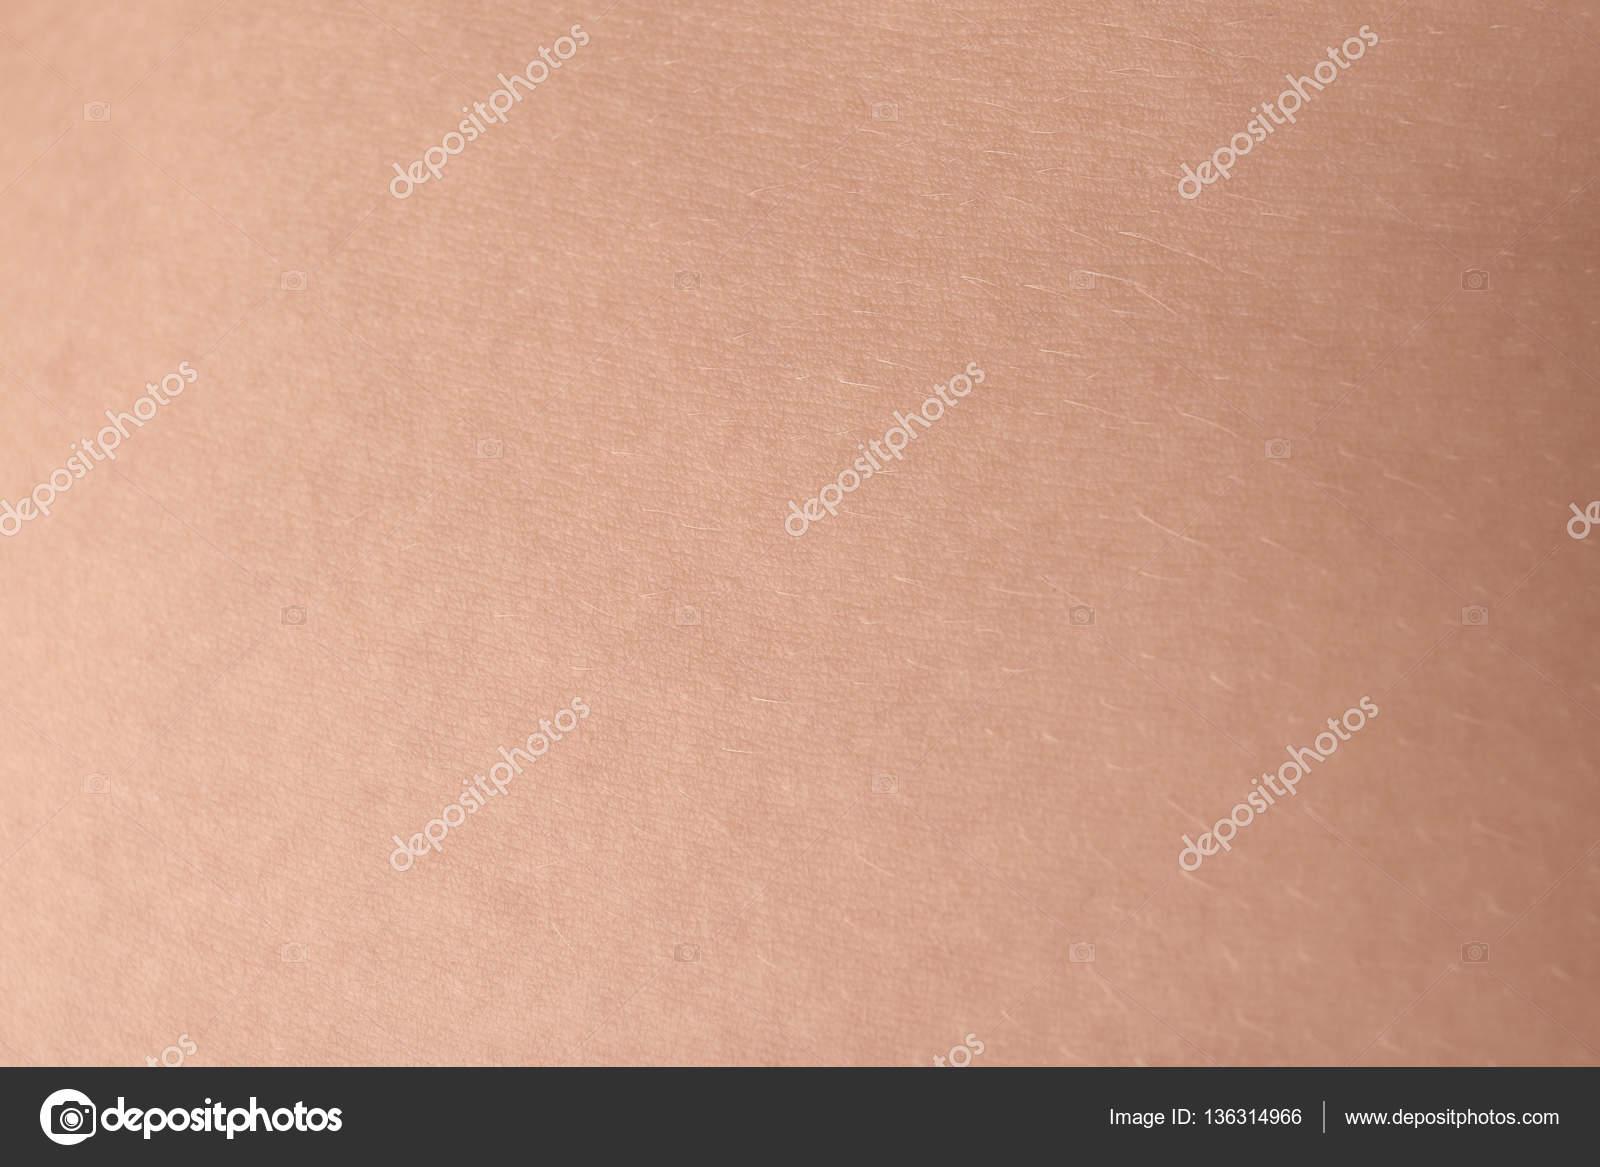 Texture della pelle chiara u foto stock belchonock